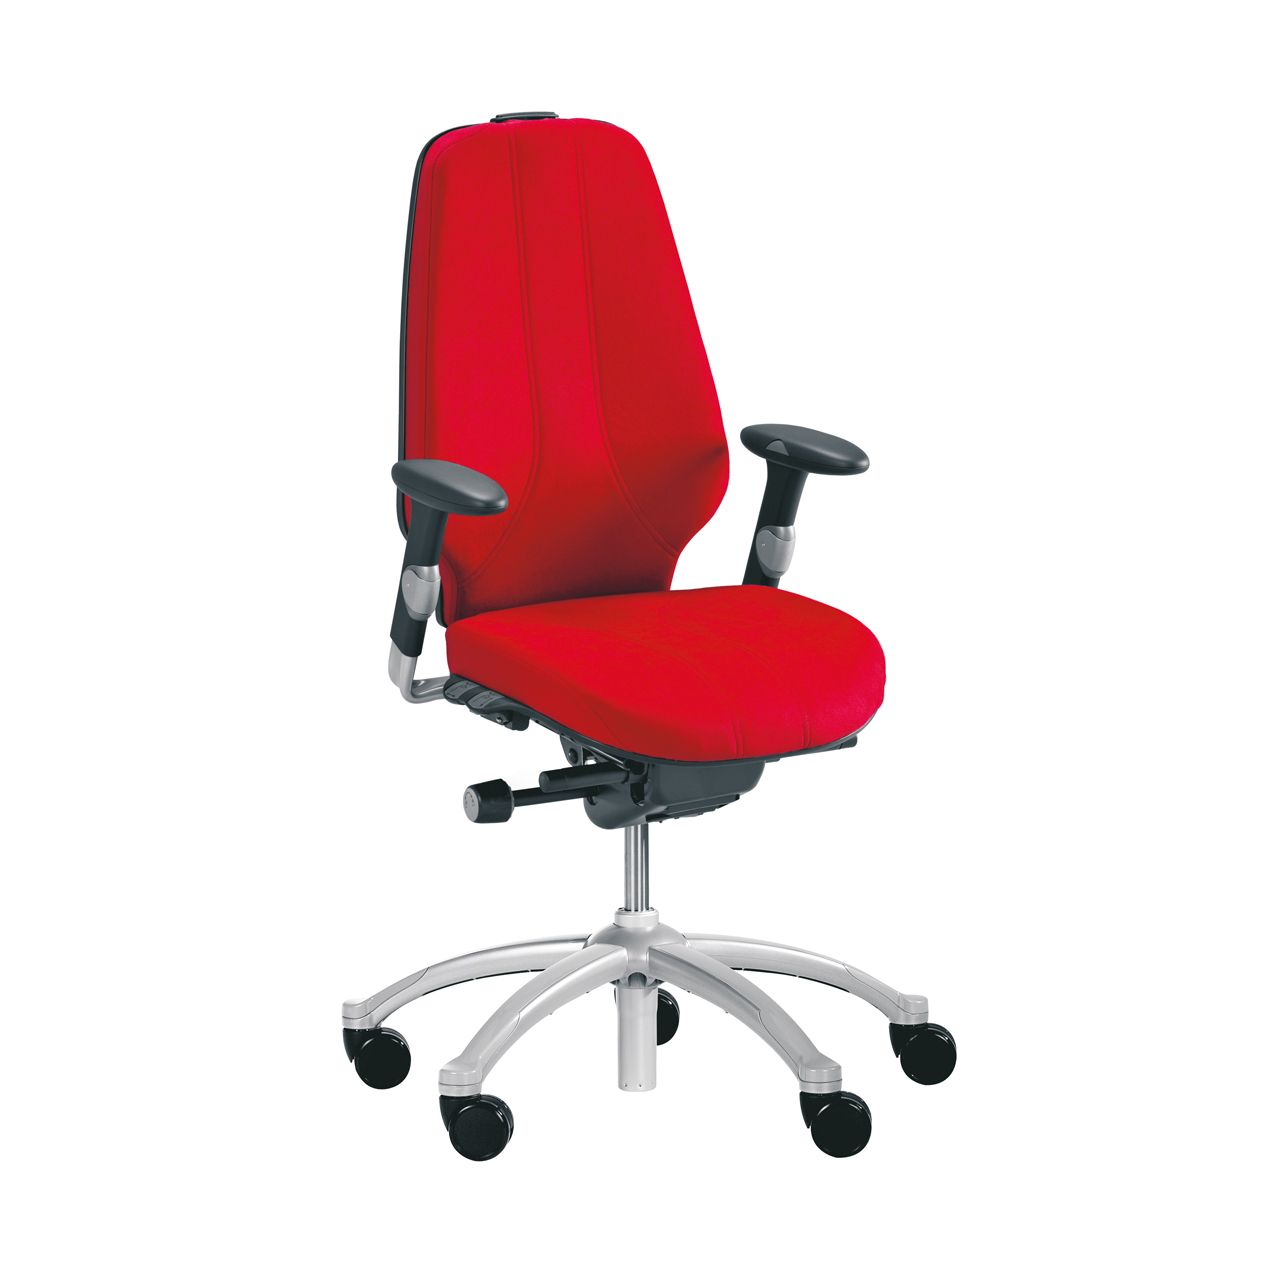 rh logic 400 24 7 ergonomische bureaustoel STKARH303 Rood